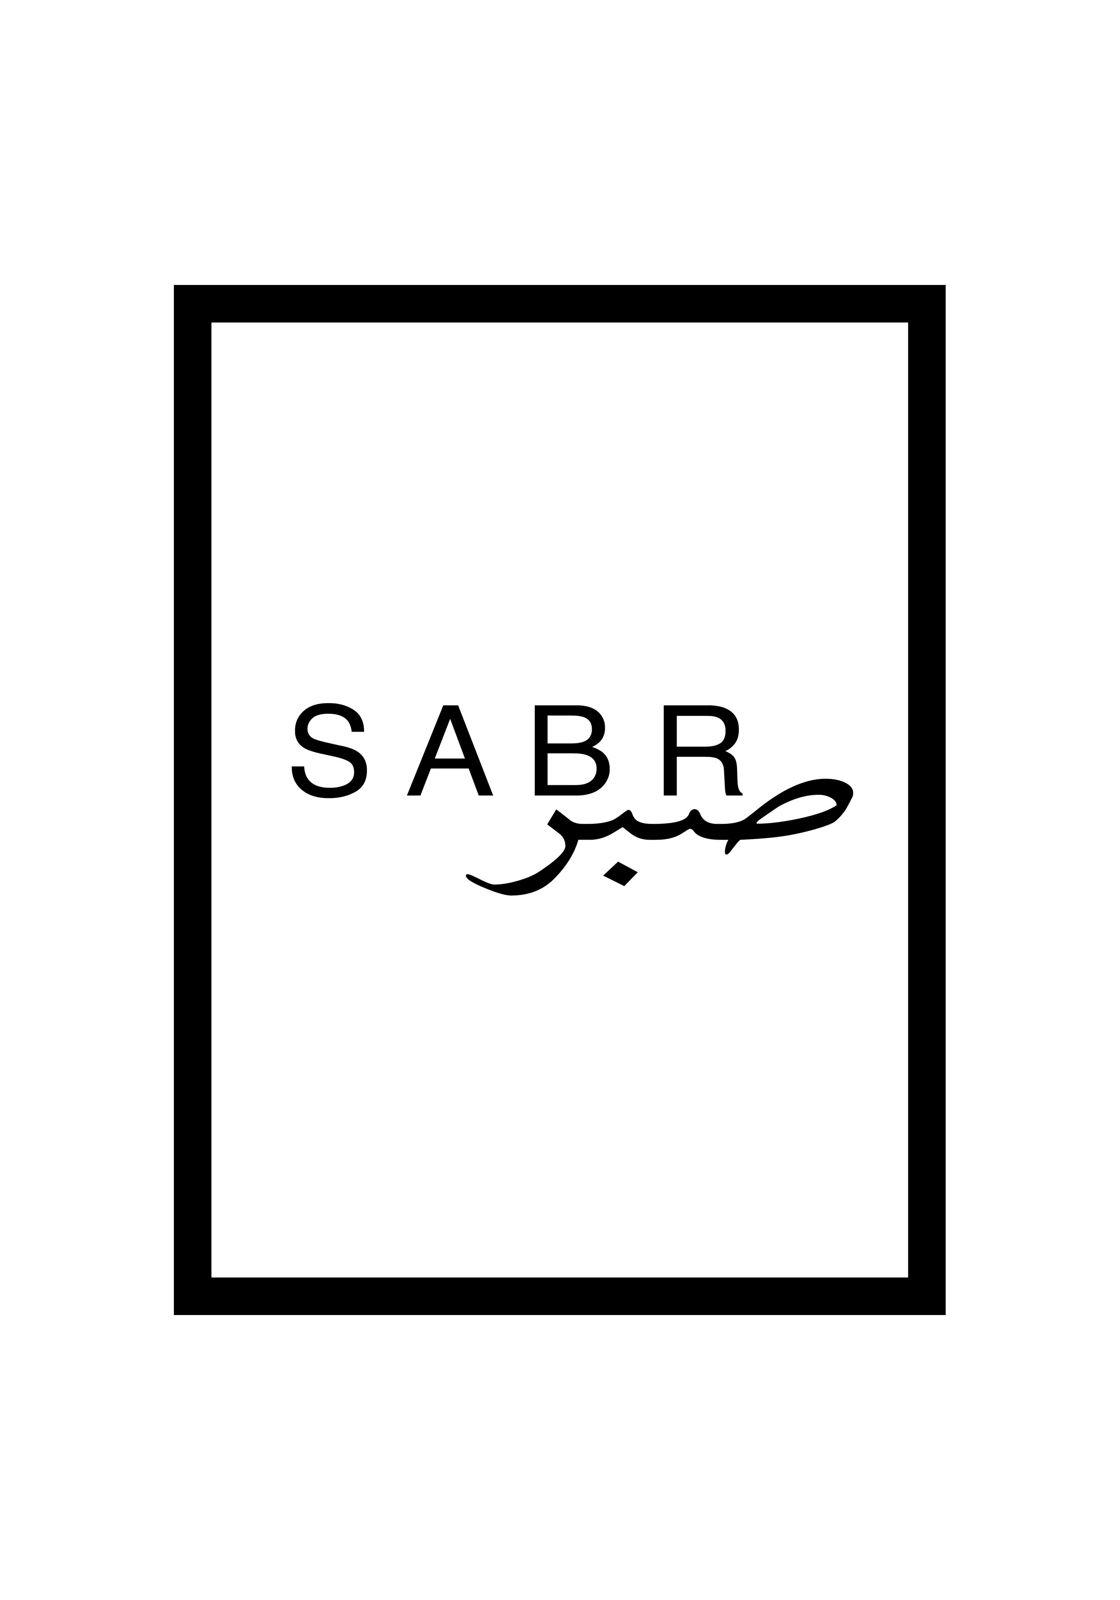 Sabr arabic_opt